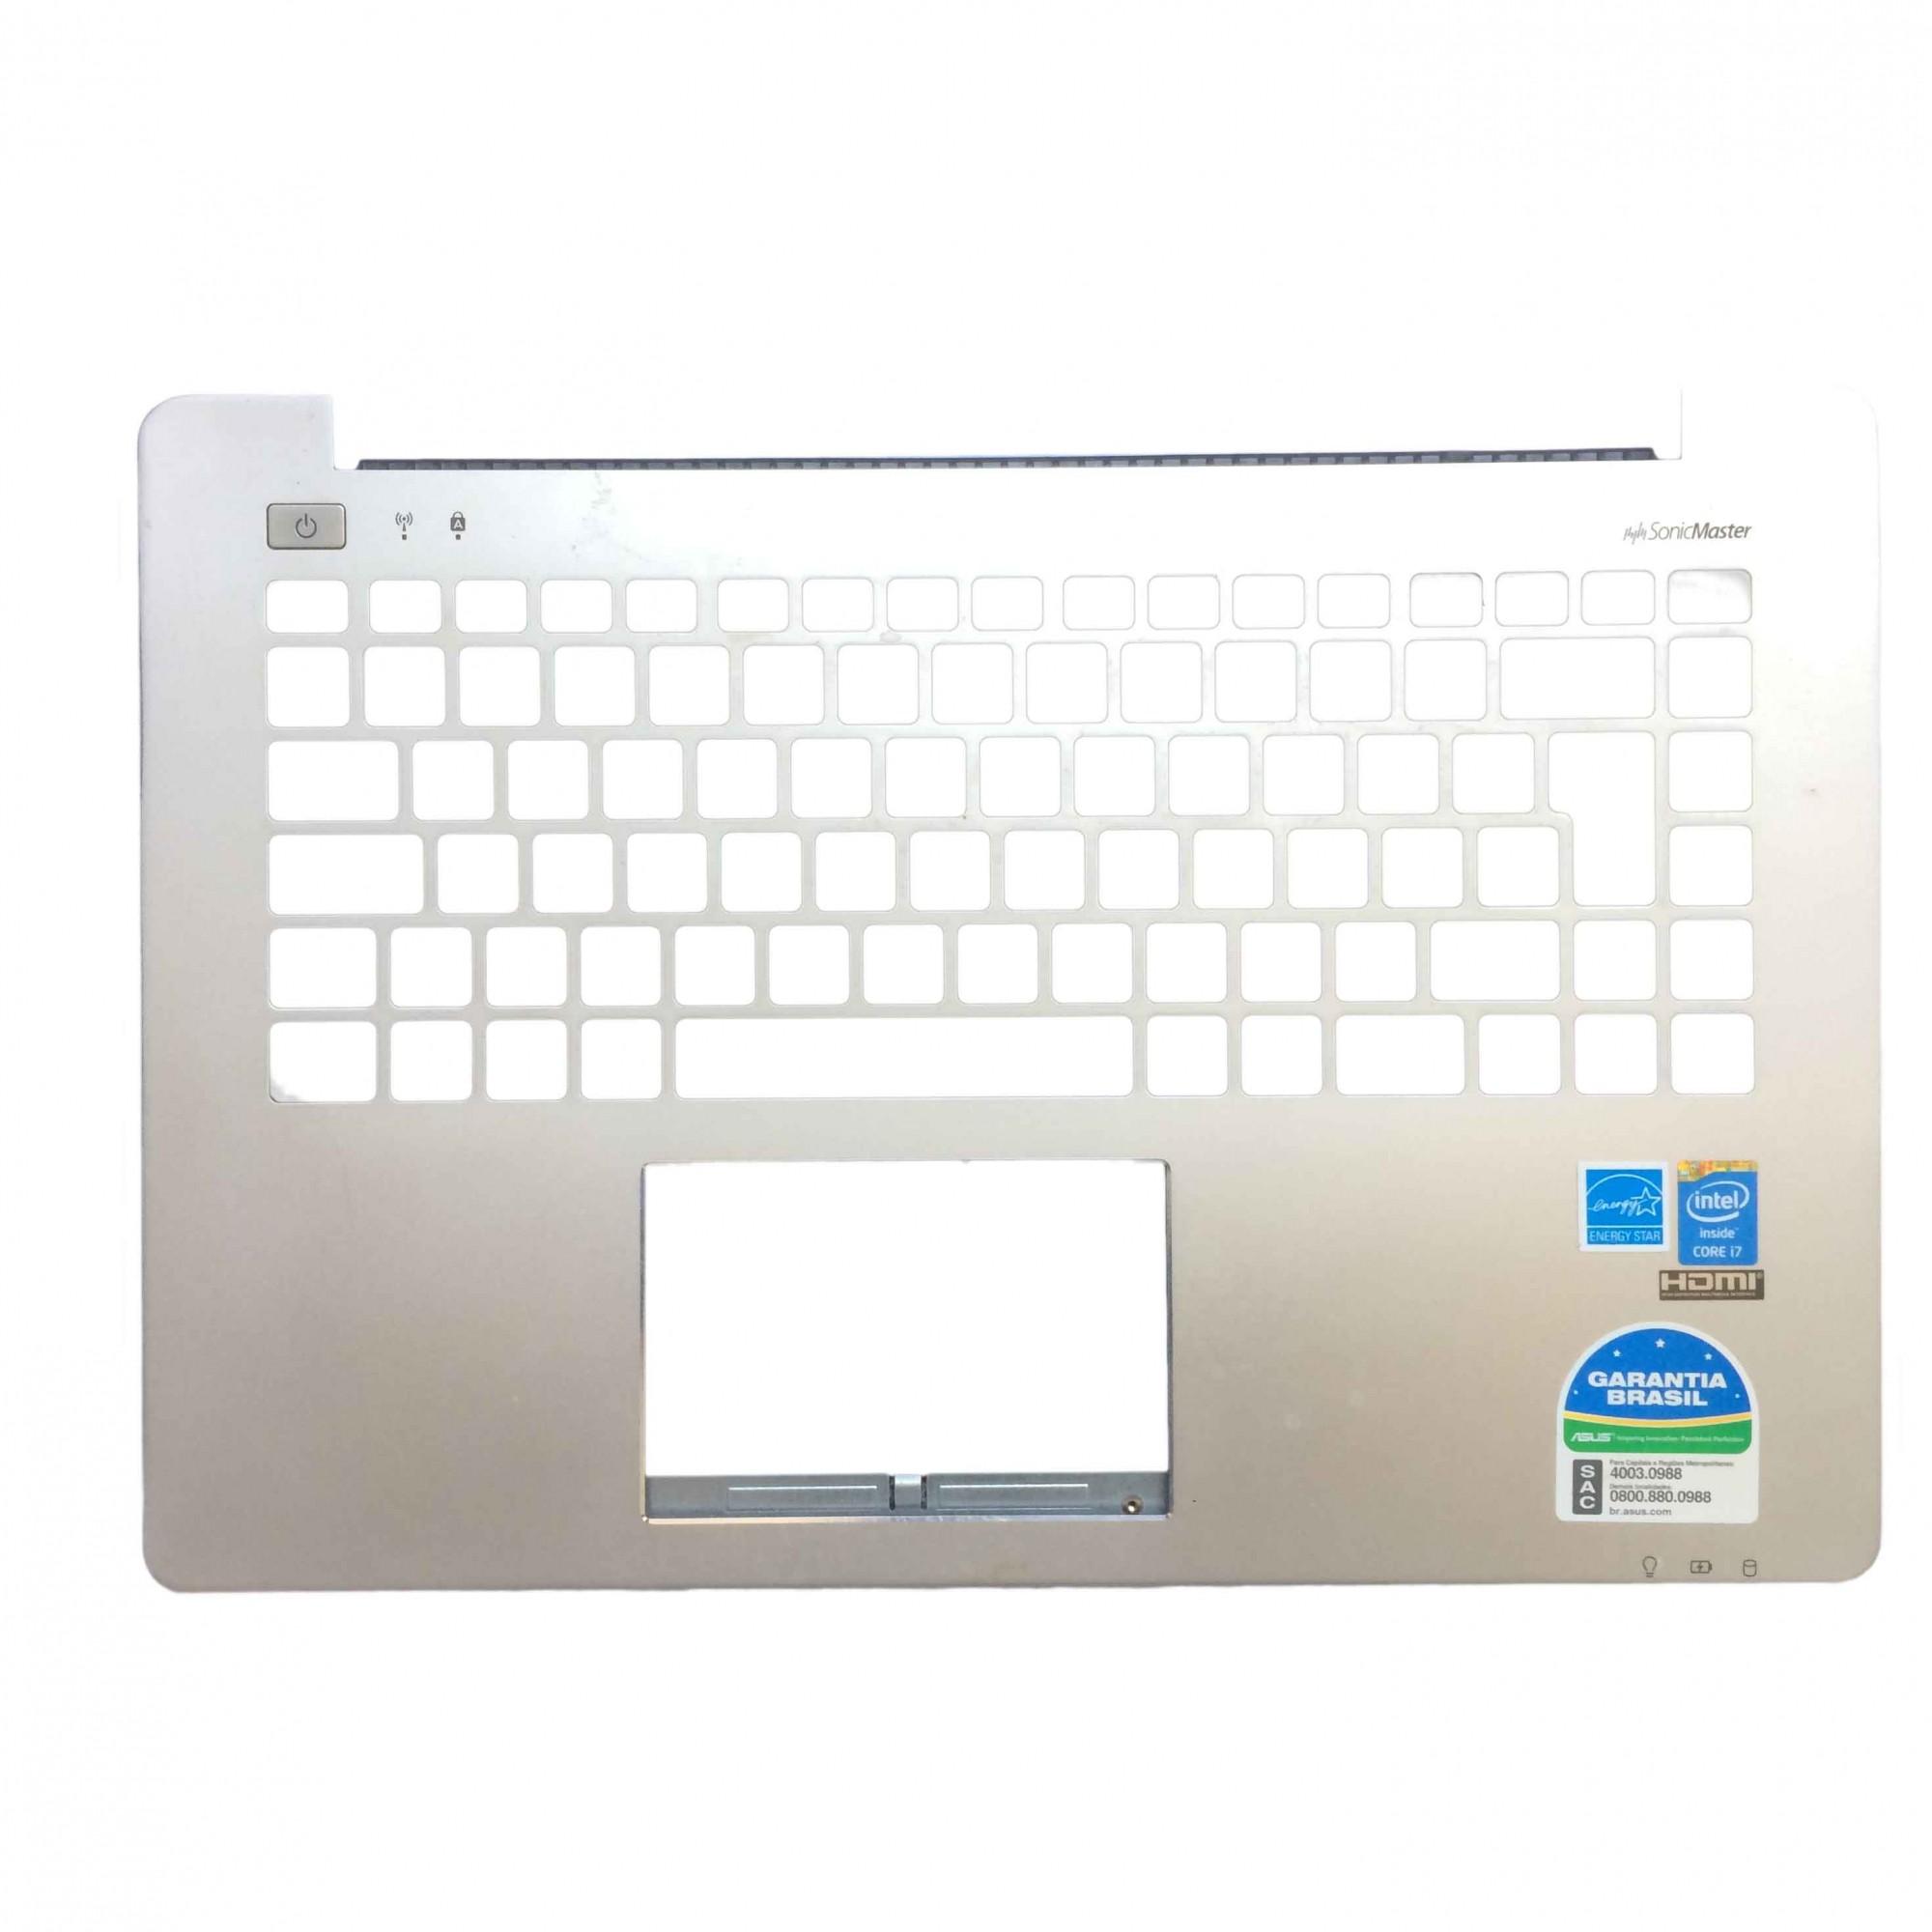 Carcaça Base Superior Notebook Asus S451LA  90NB02U1-R31GE0 PN:eazj1004010pc-bs - Retirado